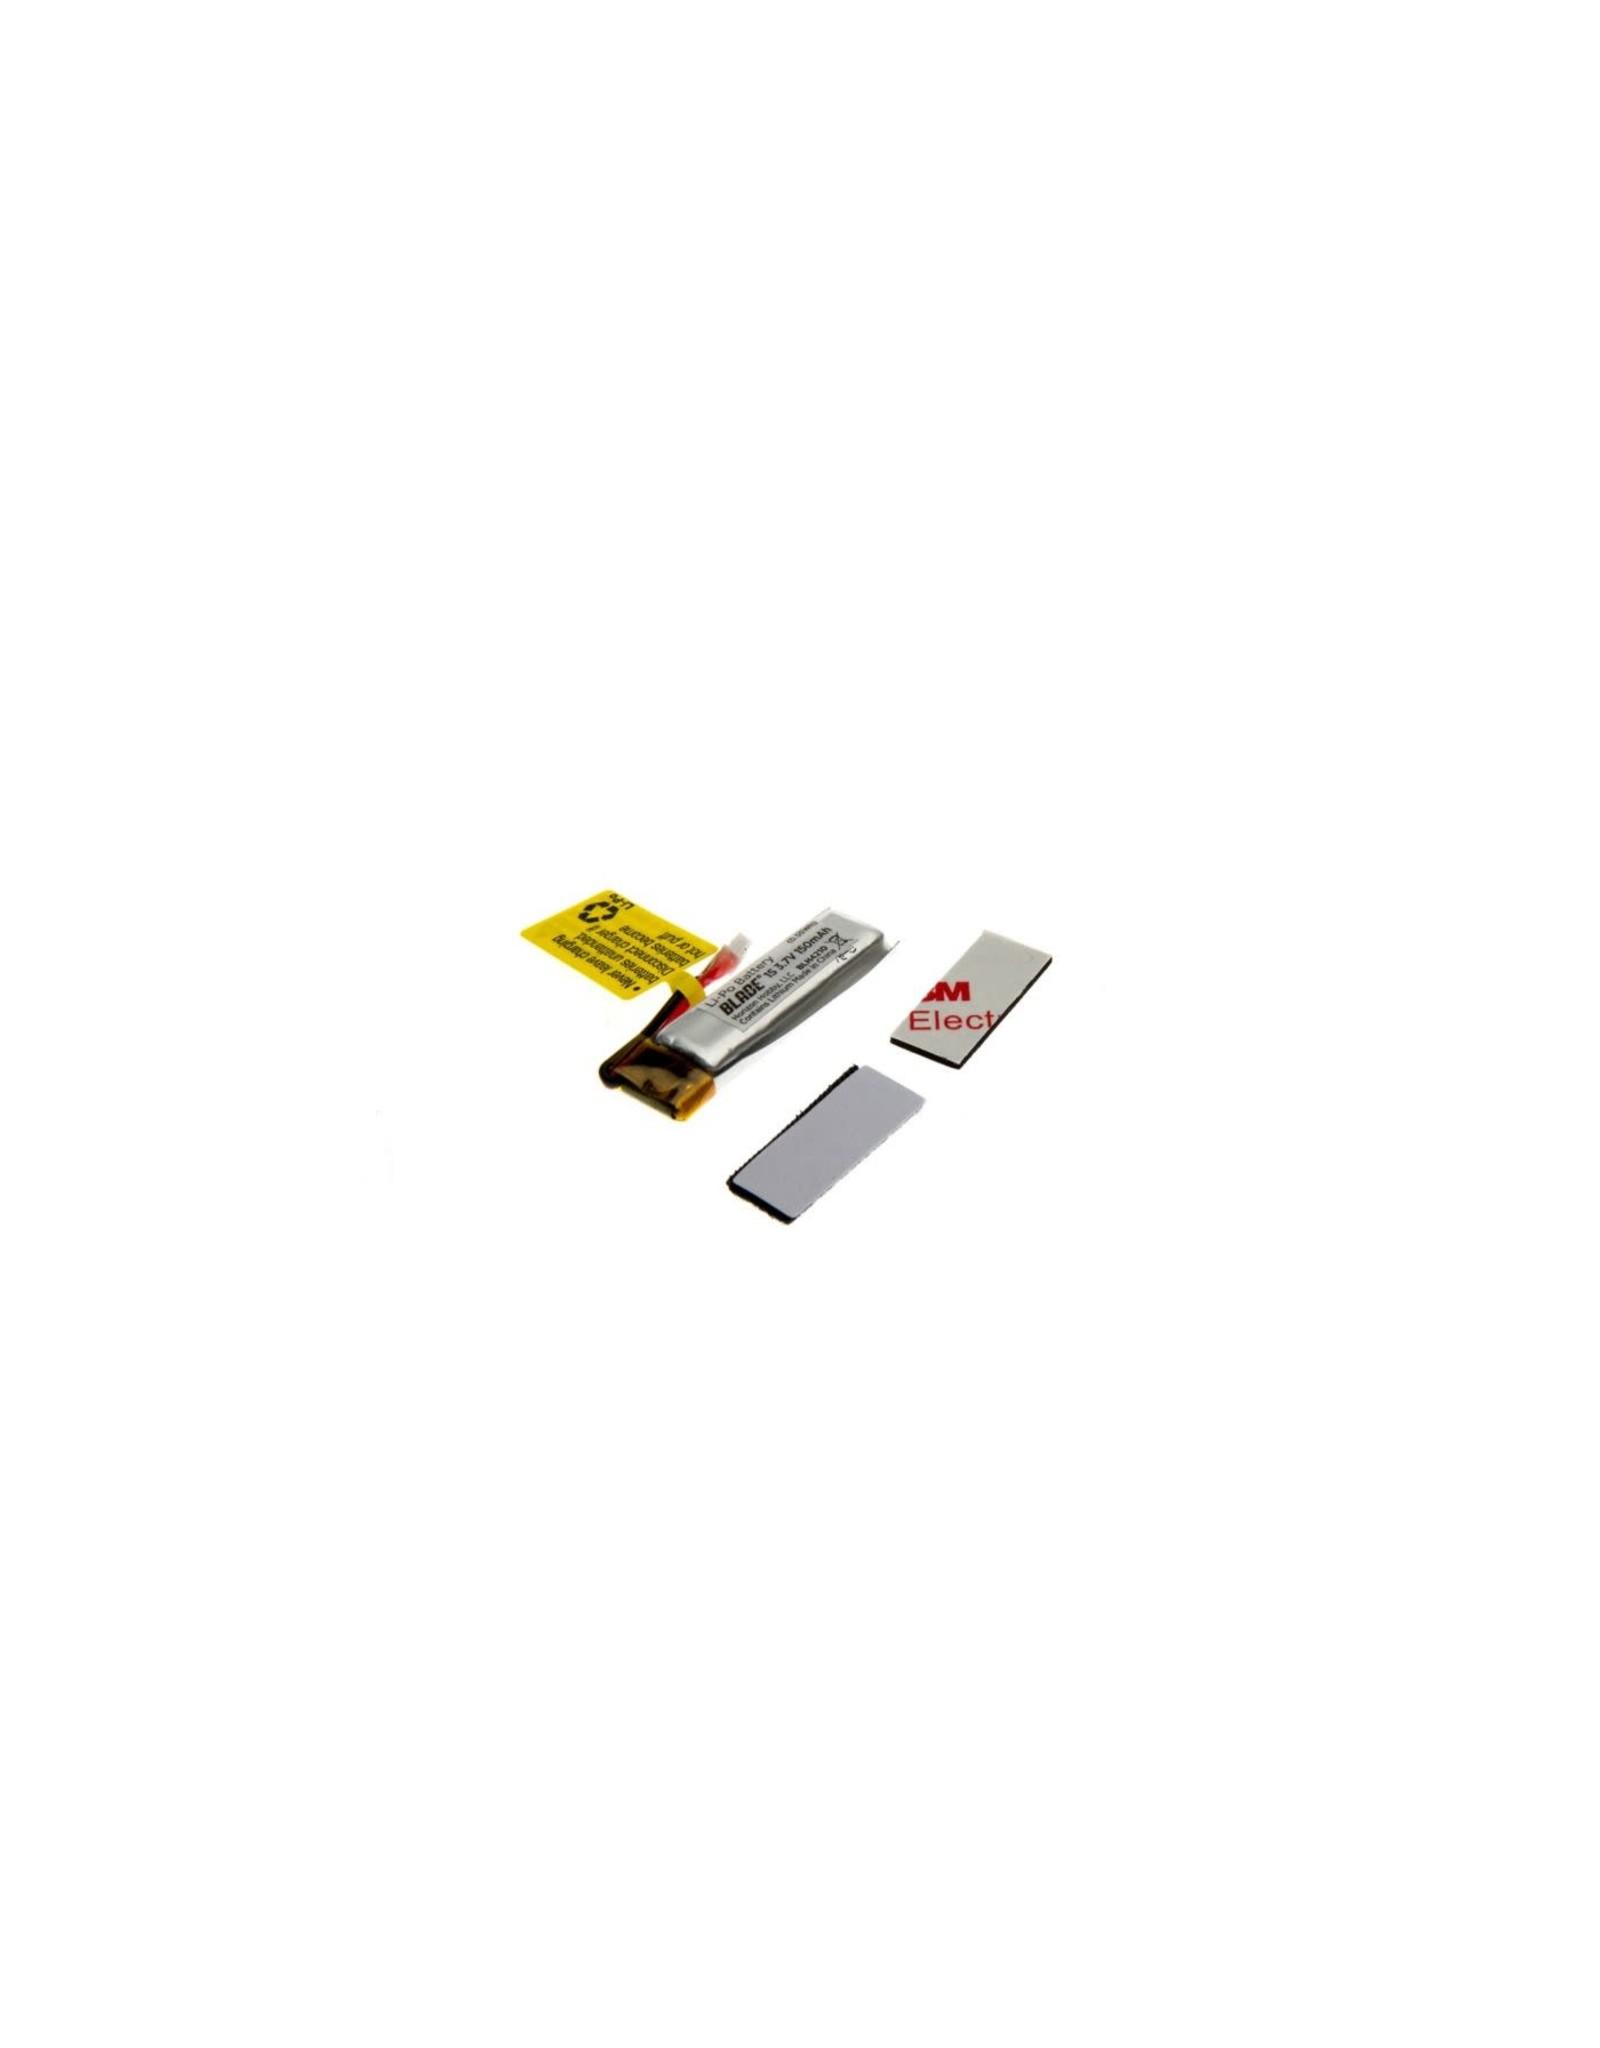 Blade Blade 150mah 1s 3.7V Lipo Battery 70 S BLH4210